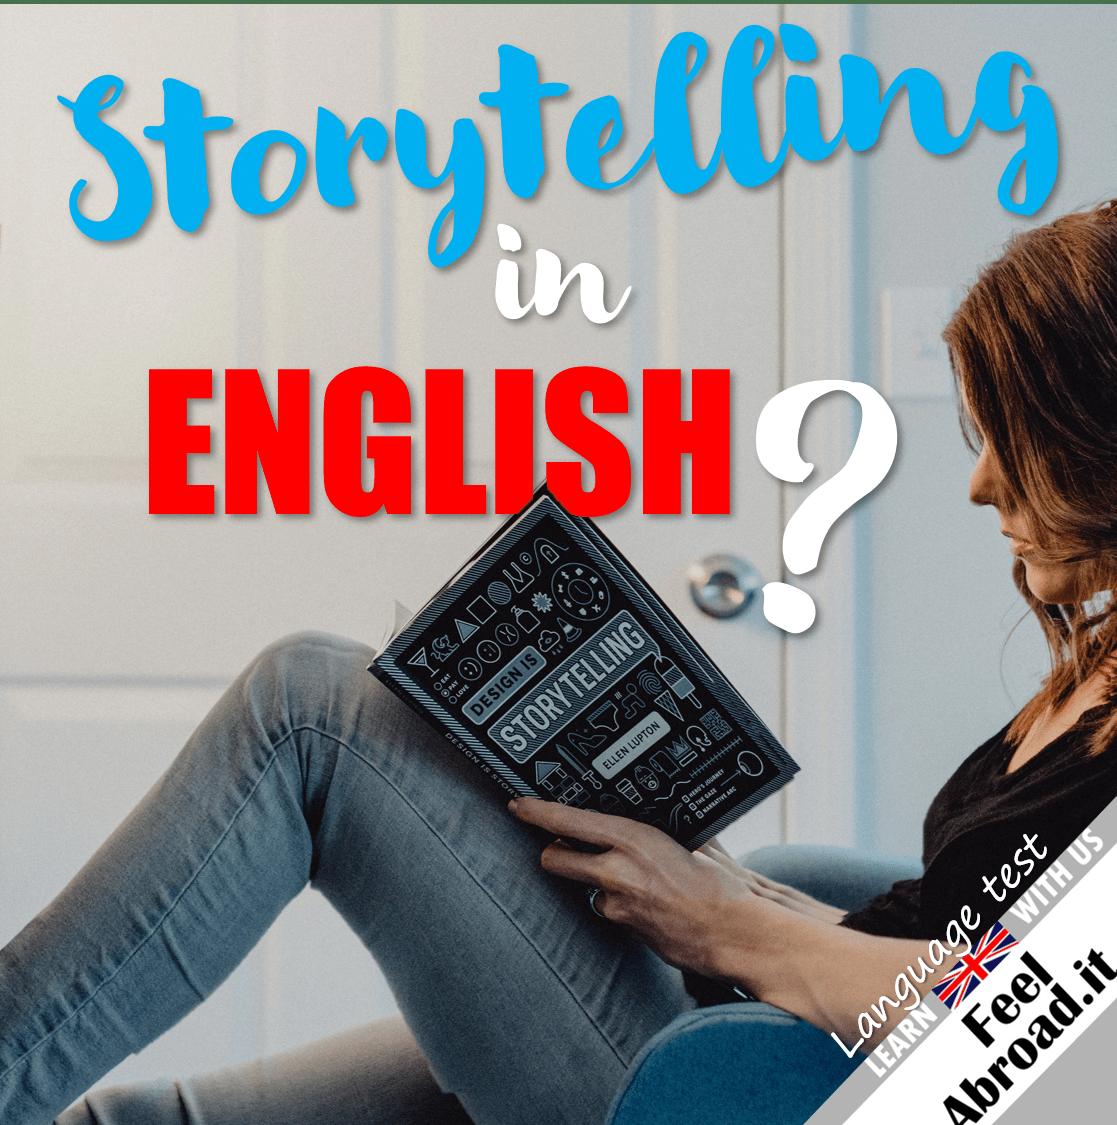 Storytelling – 5 useful linkers